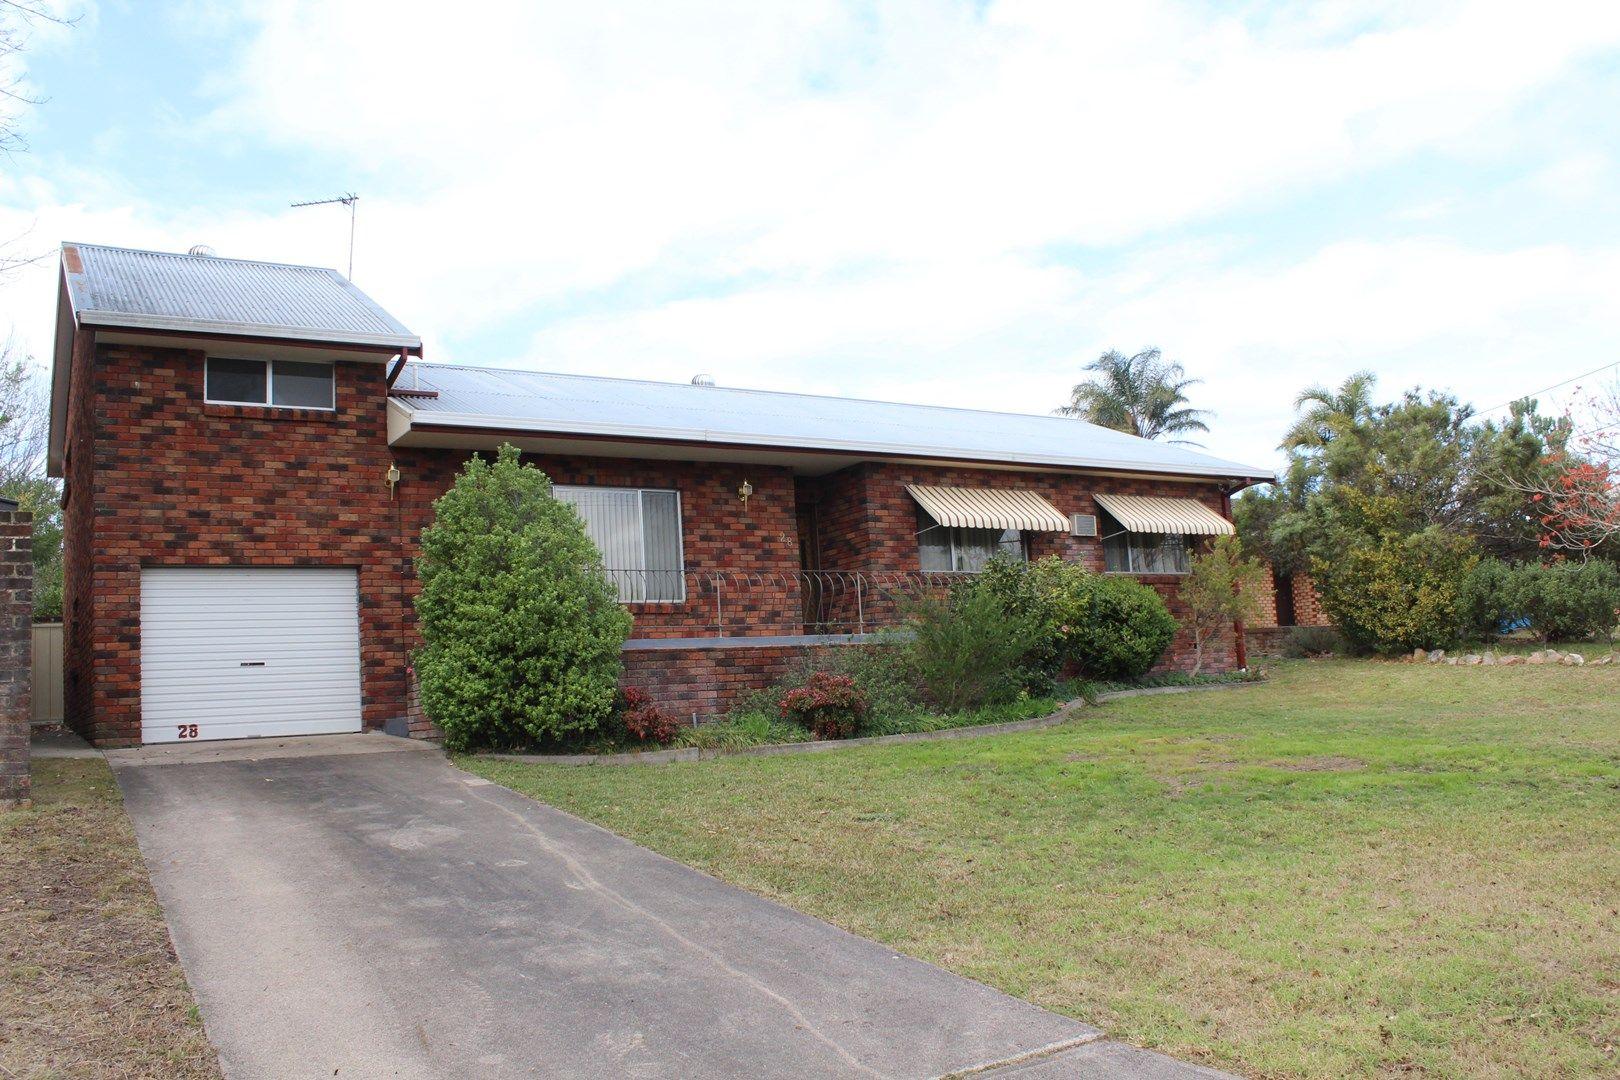 28 Glebe Avenue, Bega NSW 2550, Image 0